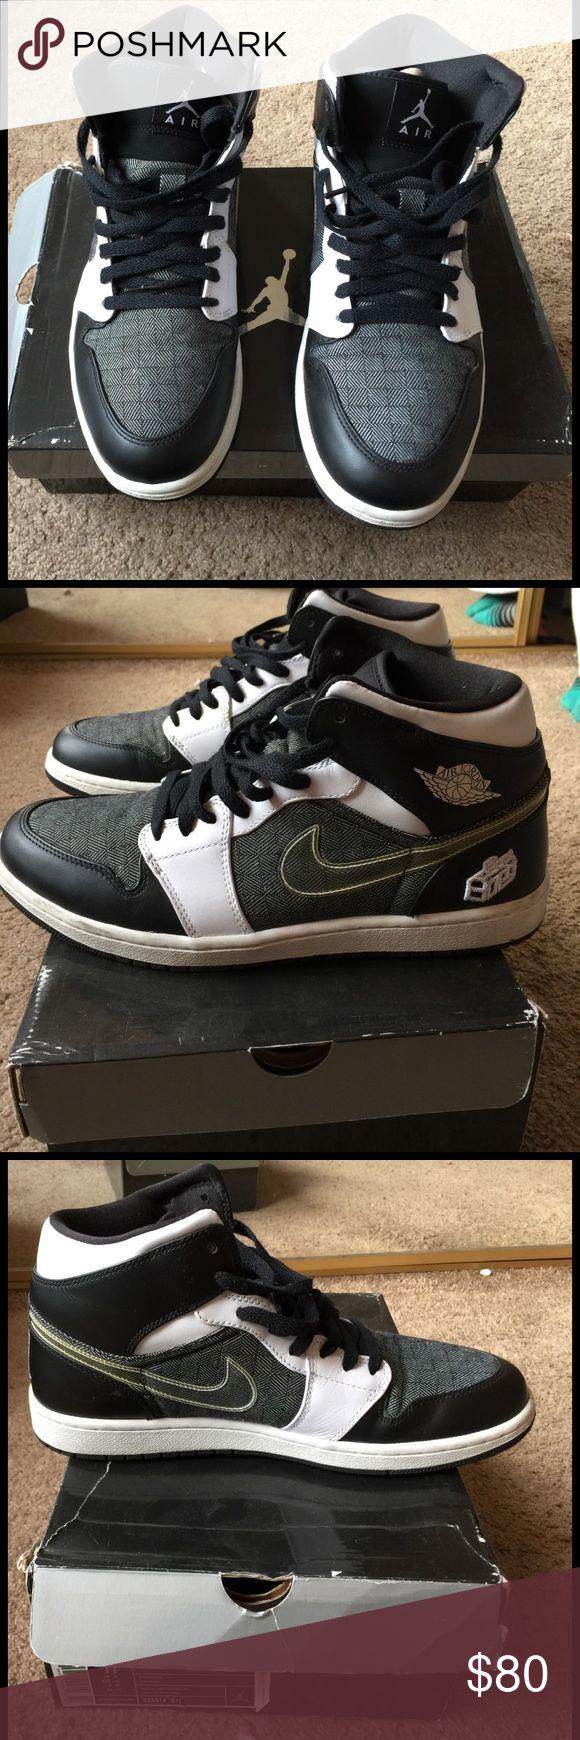 Nike Air Jordan 1 Black and white... still in good condition. Jordan Shoes Sneakers